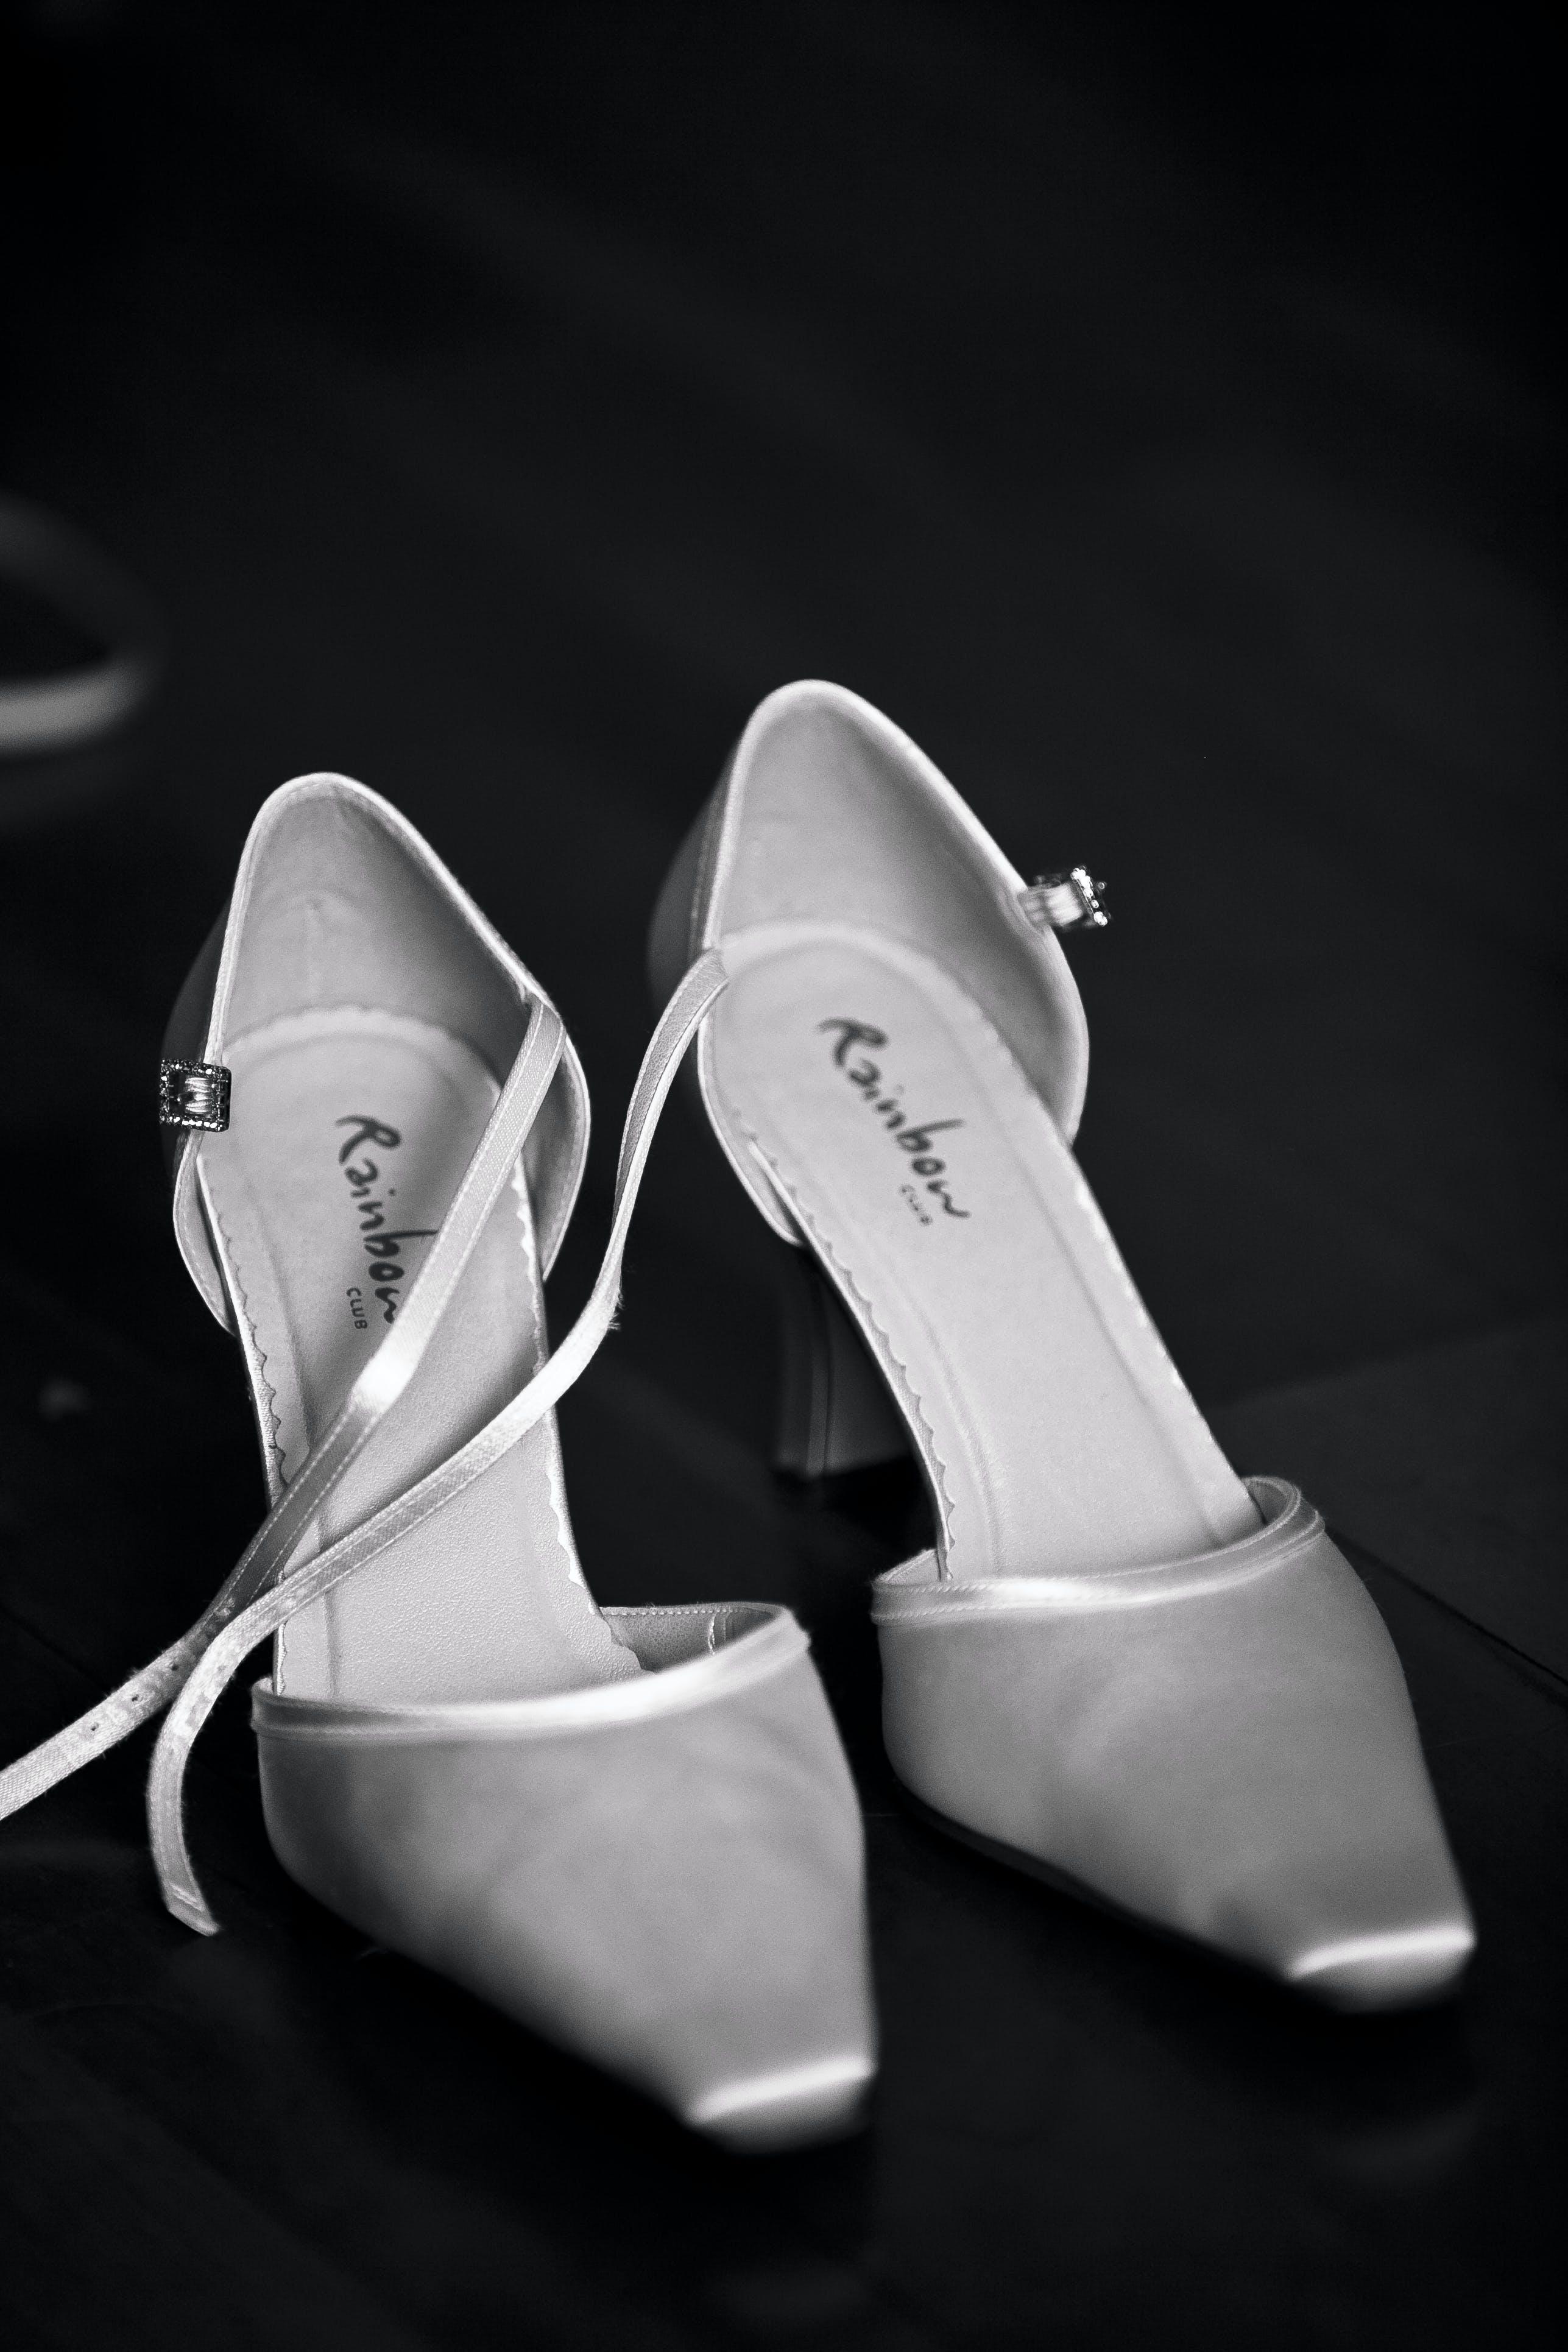 Gray Rainbow Heeled Sandals on Black Surface